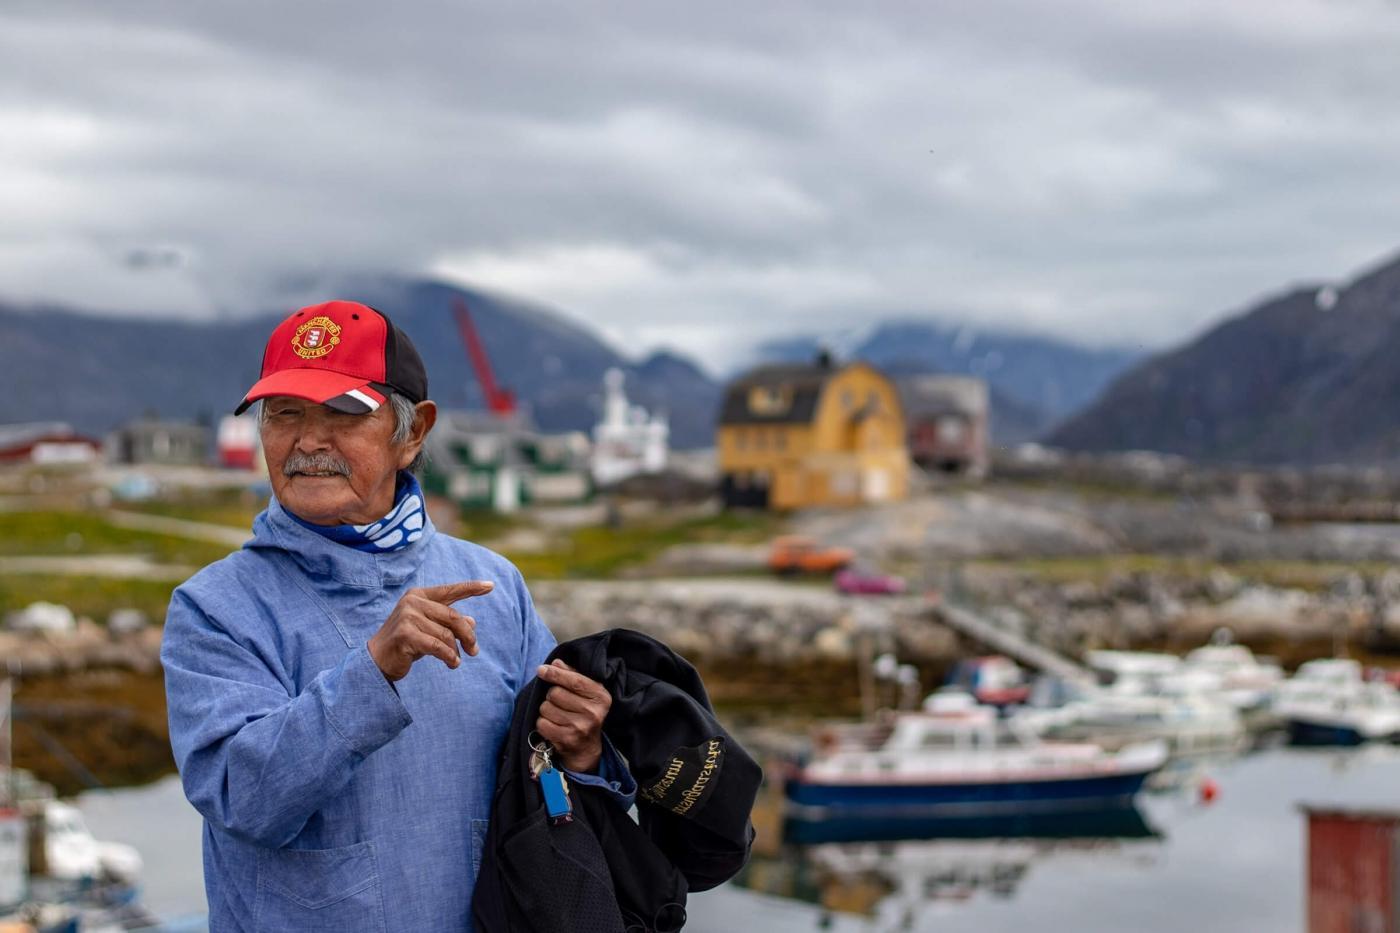 David, guide at Nanortalik Museum. Photo by Iris Timmermans - Visit Greenland